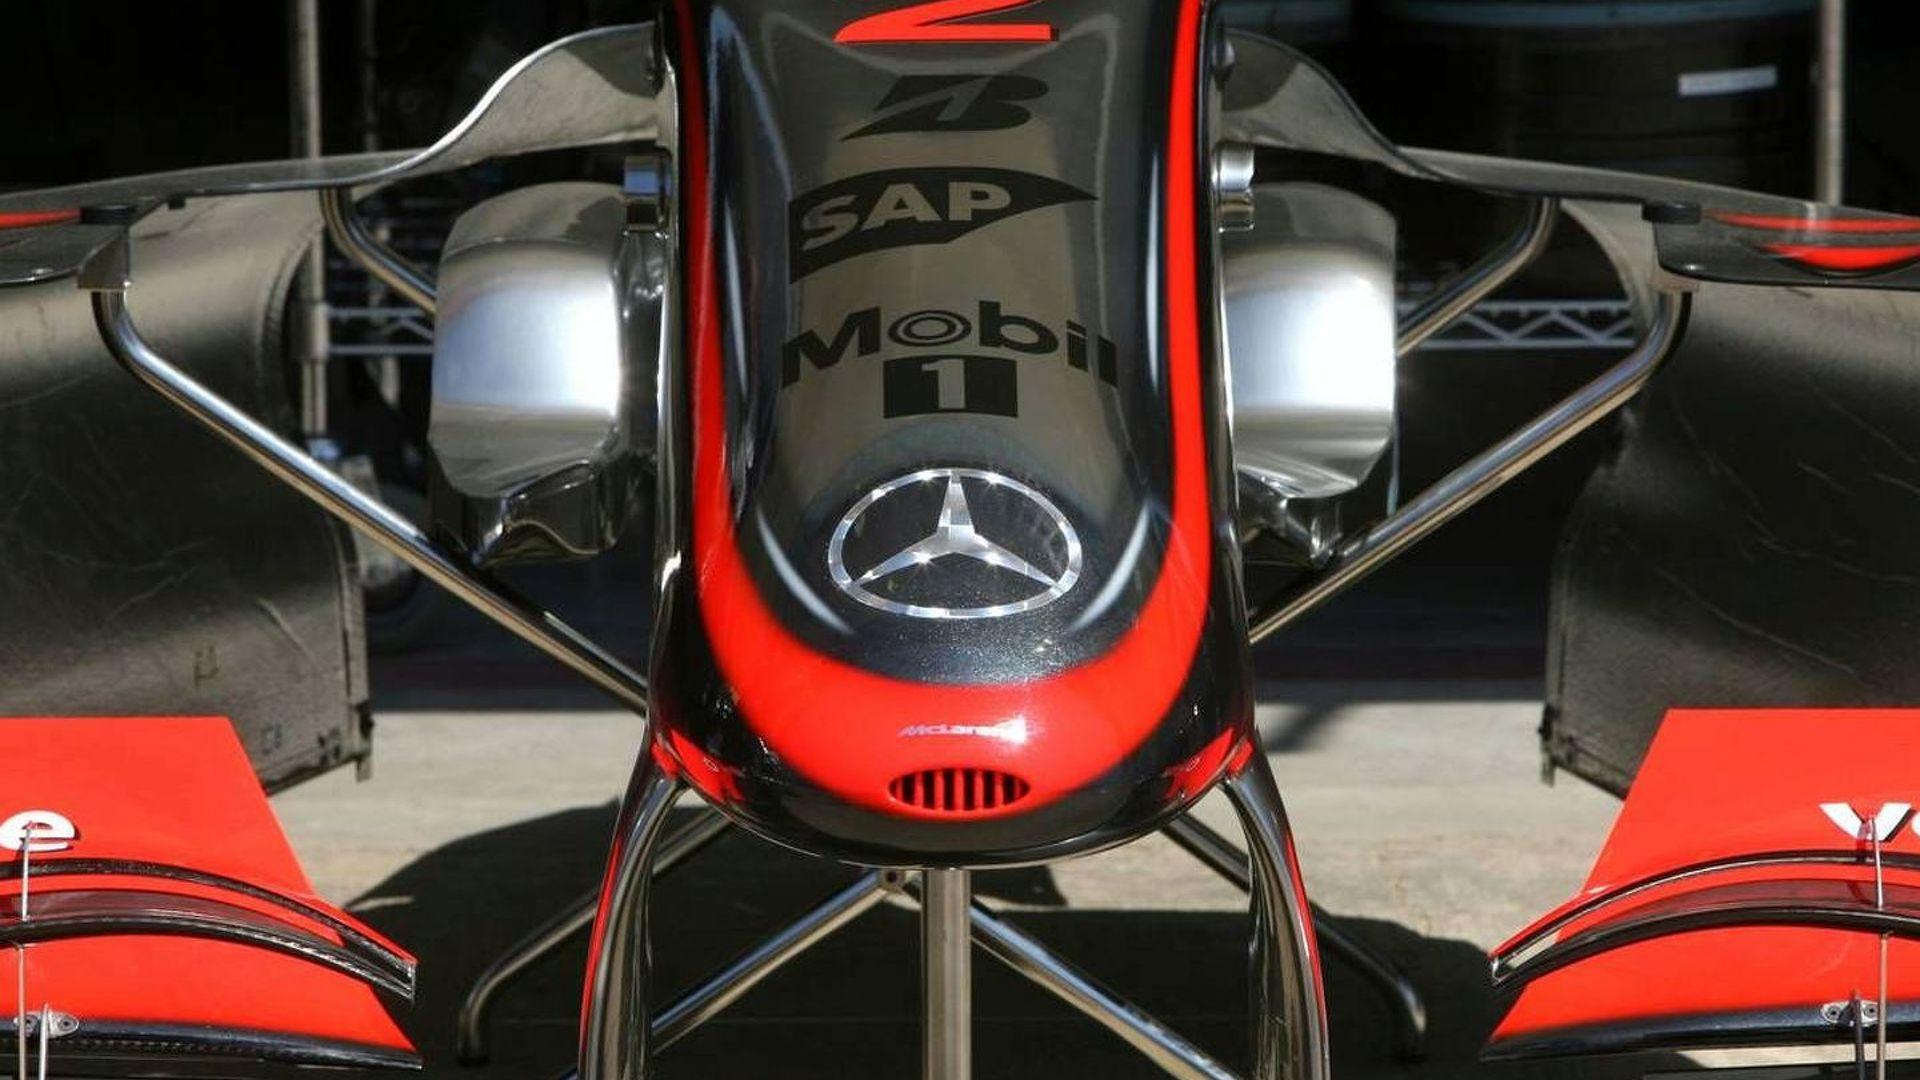 Haug plays down reports of Mercedes talks